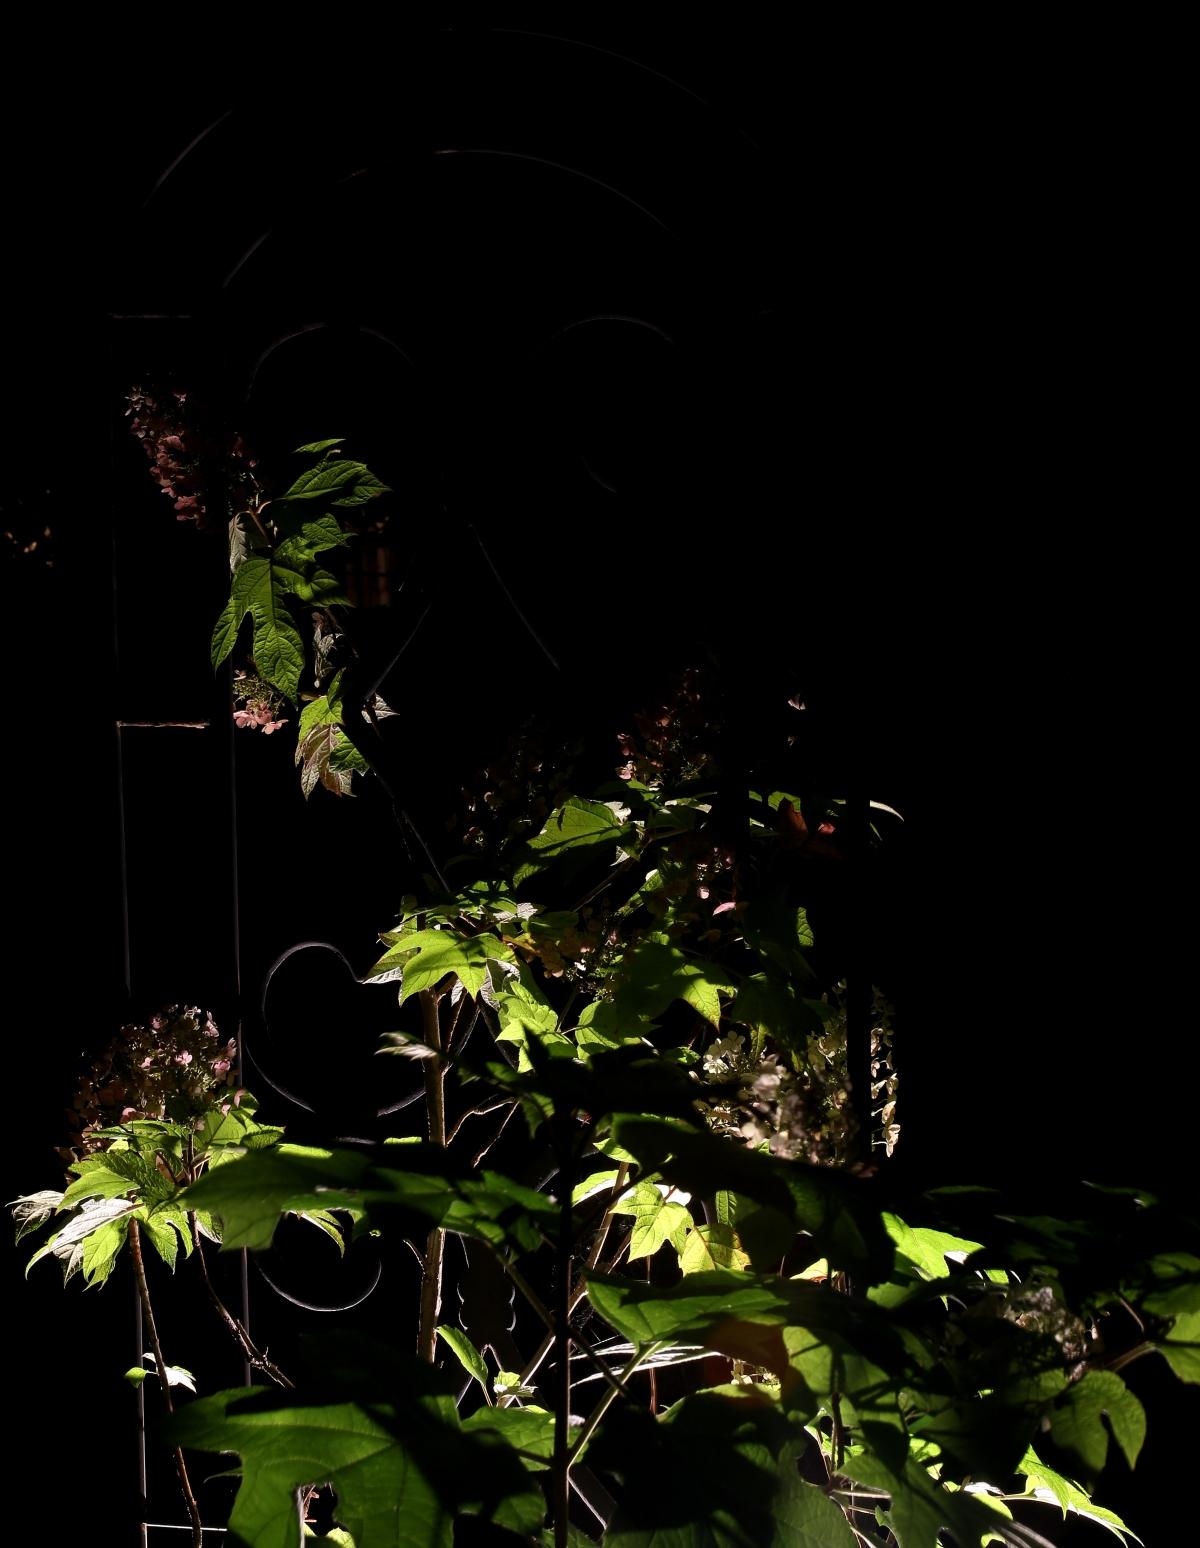 Photography ~ Backyard Landscaping–A Trellis & Oakleaf Hydrangea After Dark, 05/24 &05/27